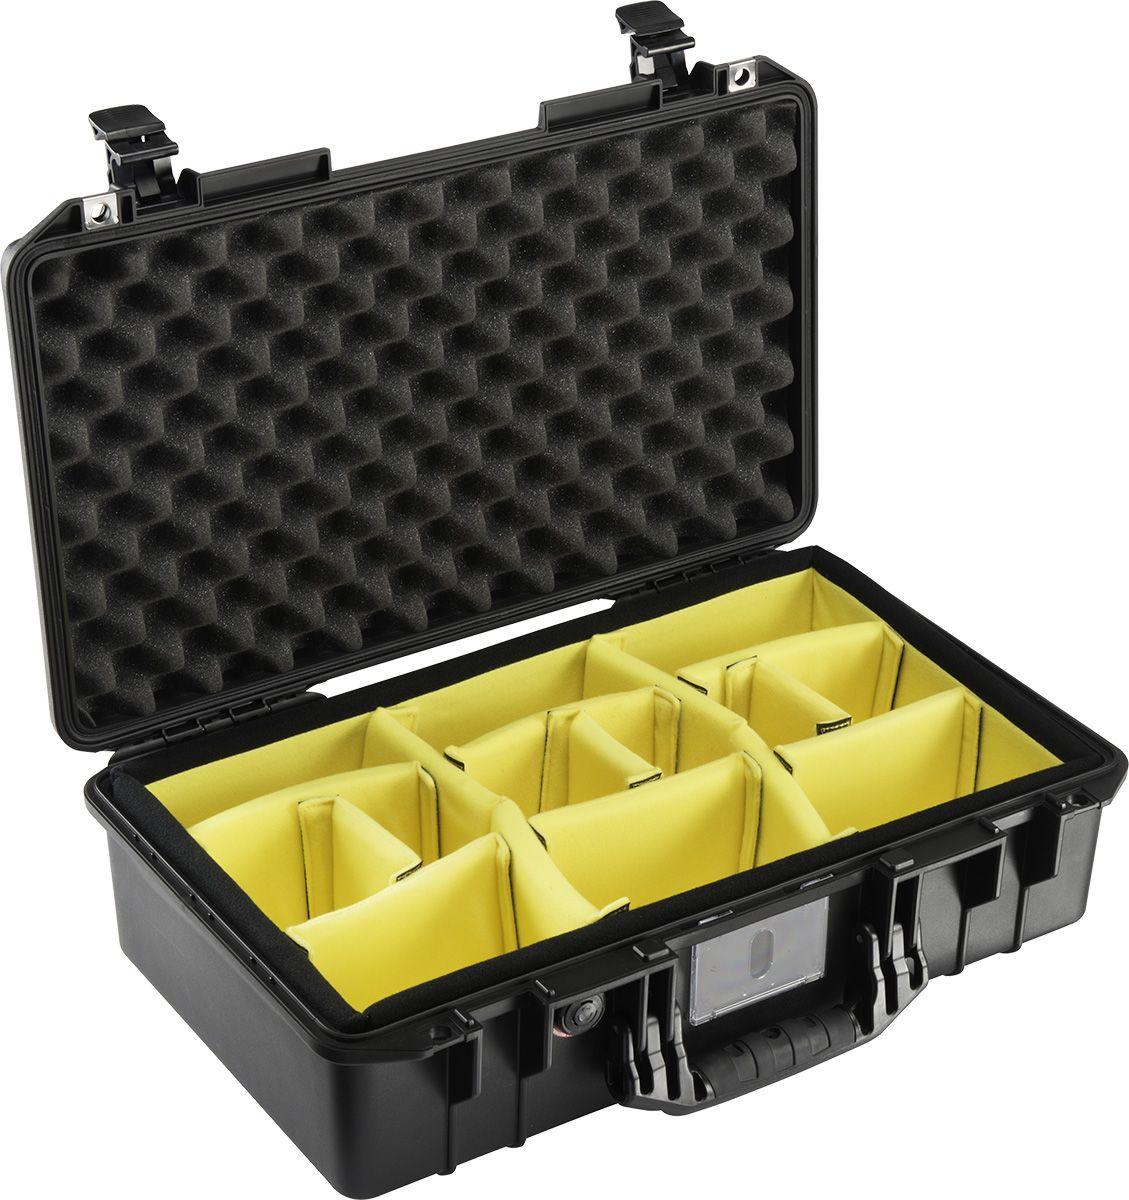 1525 Air Case Pelican Official Store in 2020 Pelican